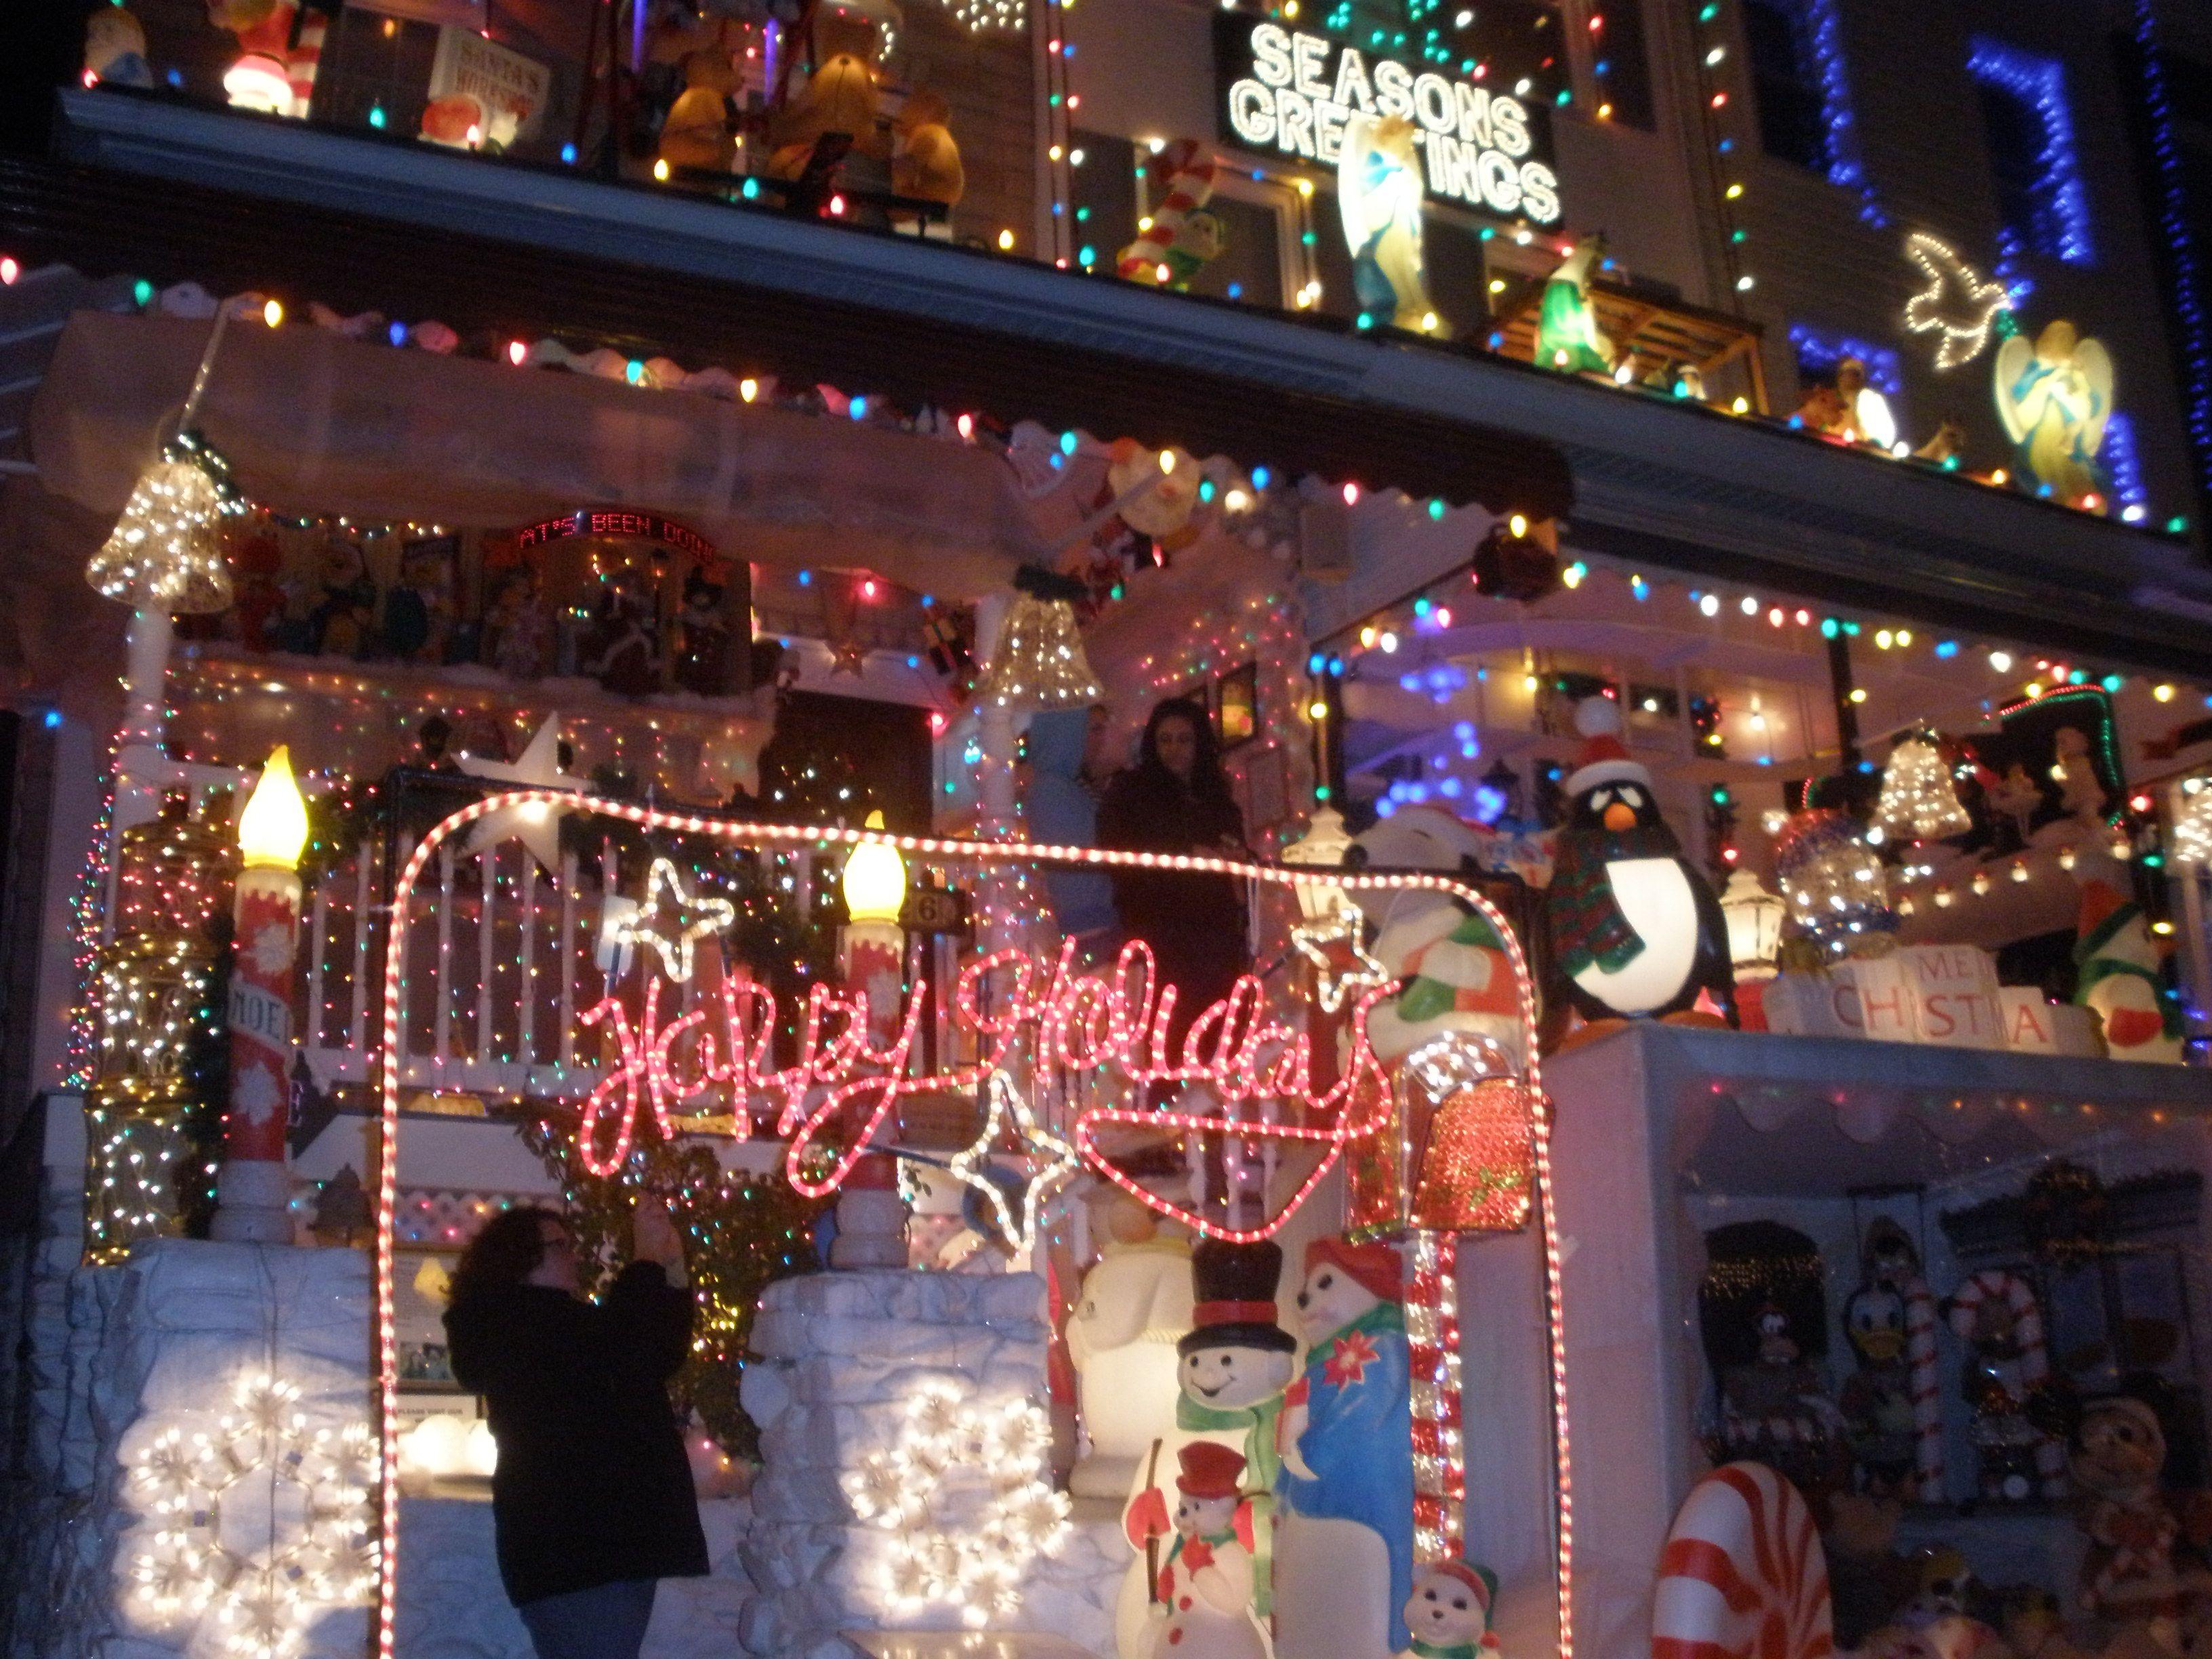 Baltimore Sightseeing: Christmas Lights in Hampden